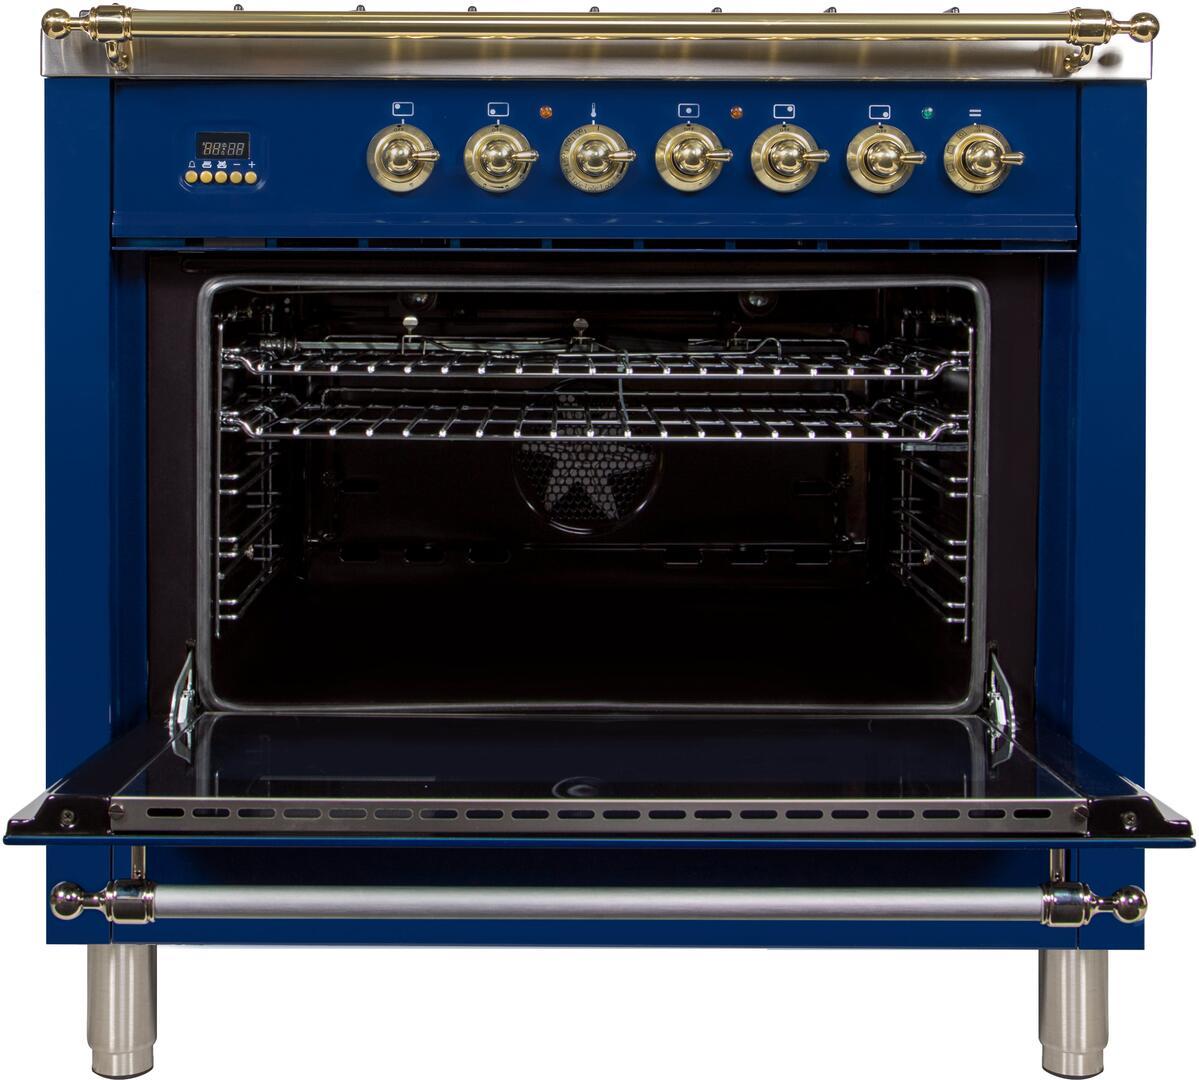 Ilve Nostalgie UPN90FDMPBL Freestanding Dual Fuel Range Blue, ILVE UPN90FDMPBL Range open door